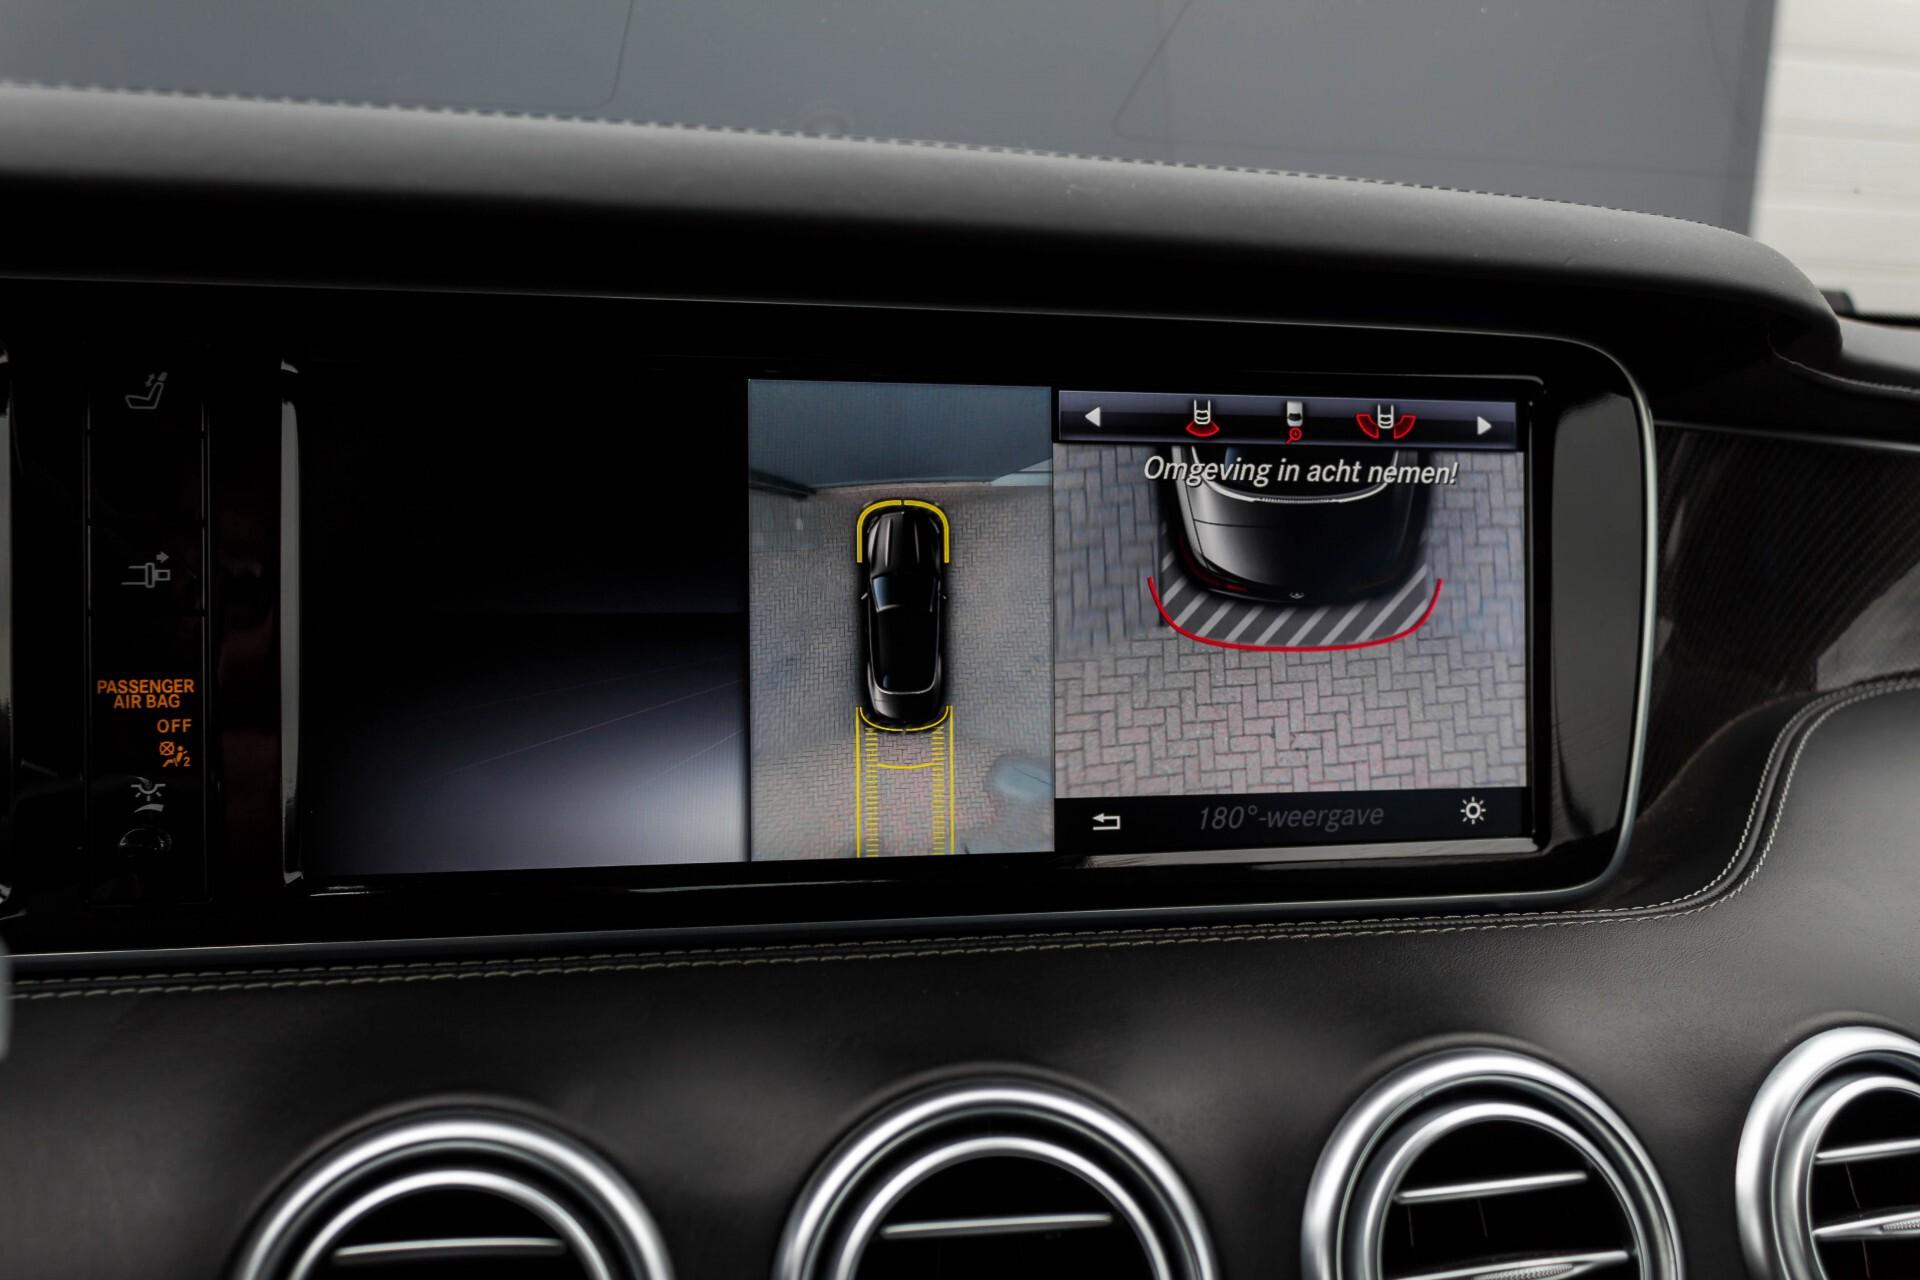 Mercedes-Benz S-Klasse Cabrio 63 AMG 4-M Ceramic/Designo/Carbon/Burmester High End Aut Foto 19